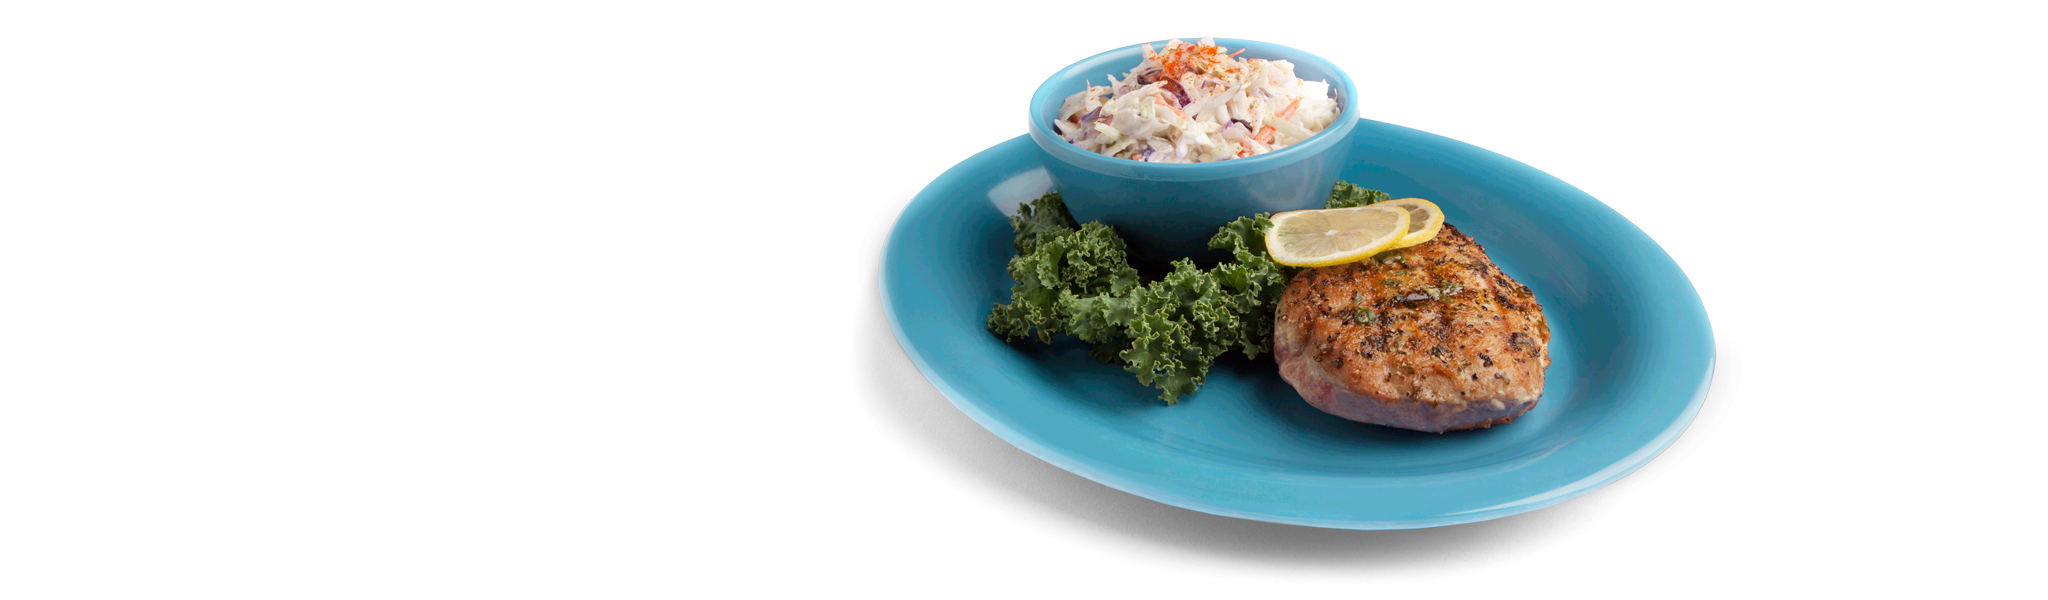 nomnomnom-grilled-tuna-colorado.png